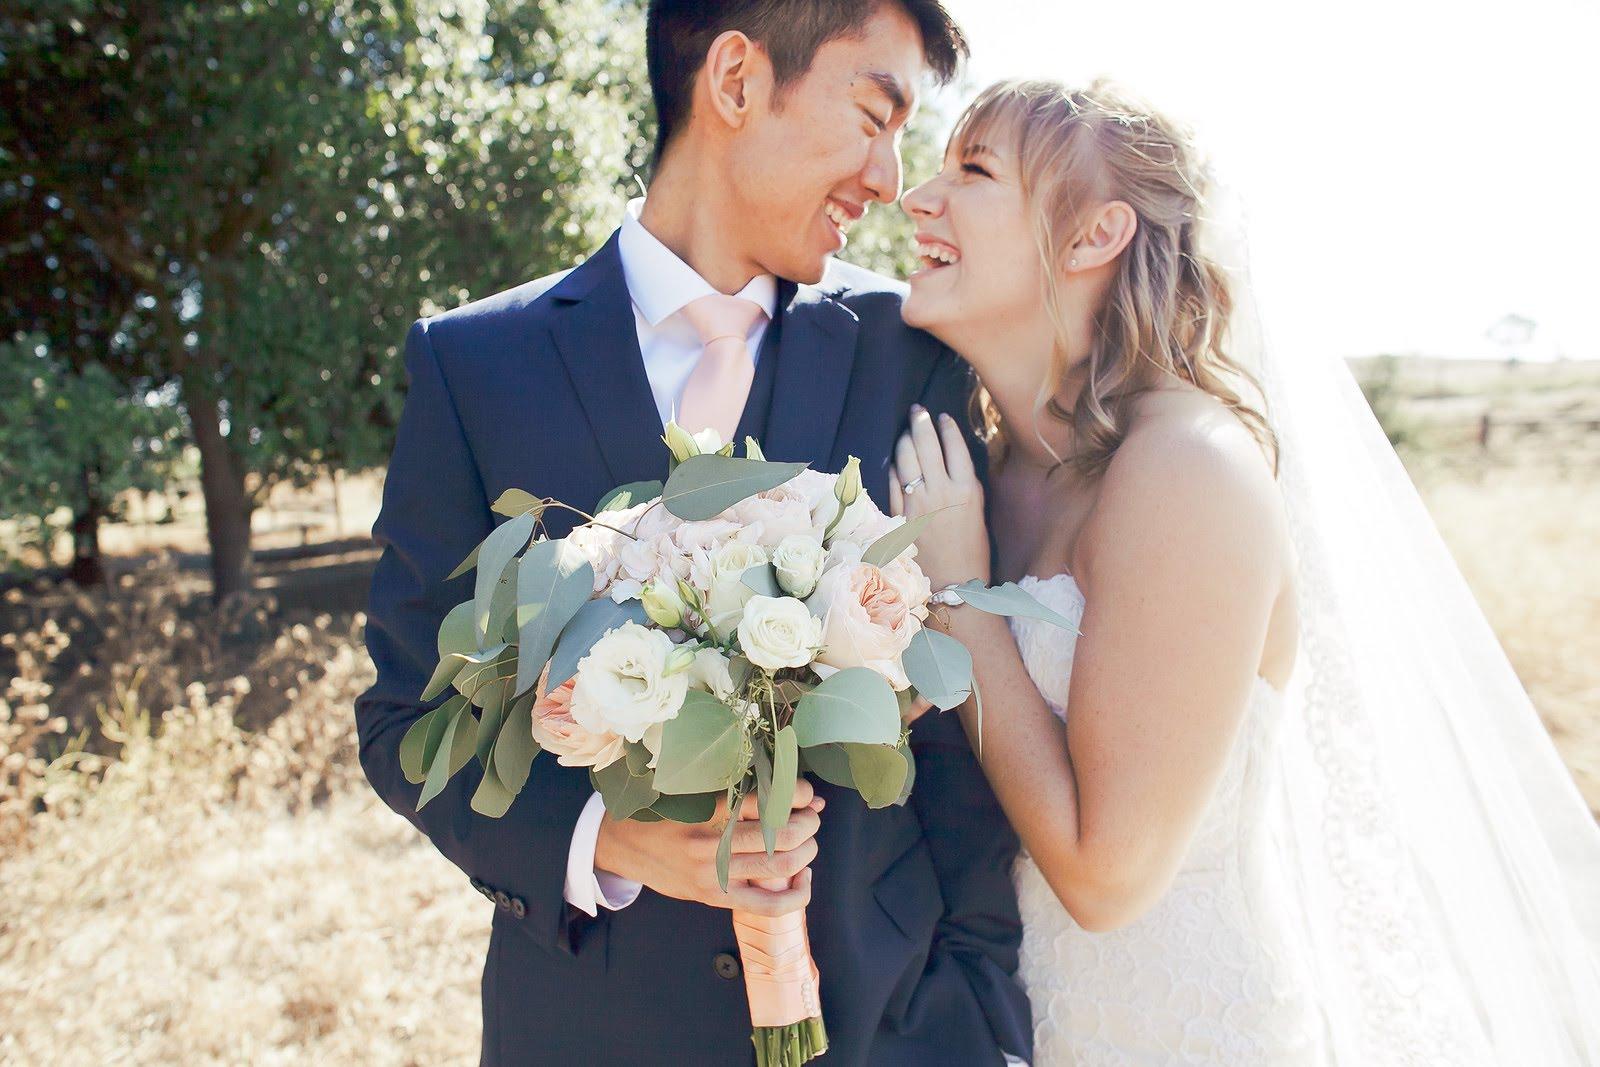 Simon & Myra - Wedding Florals - Floral Design - Ashley Hur - Hip Hip Hooray Dot Love